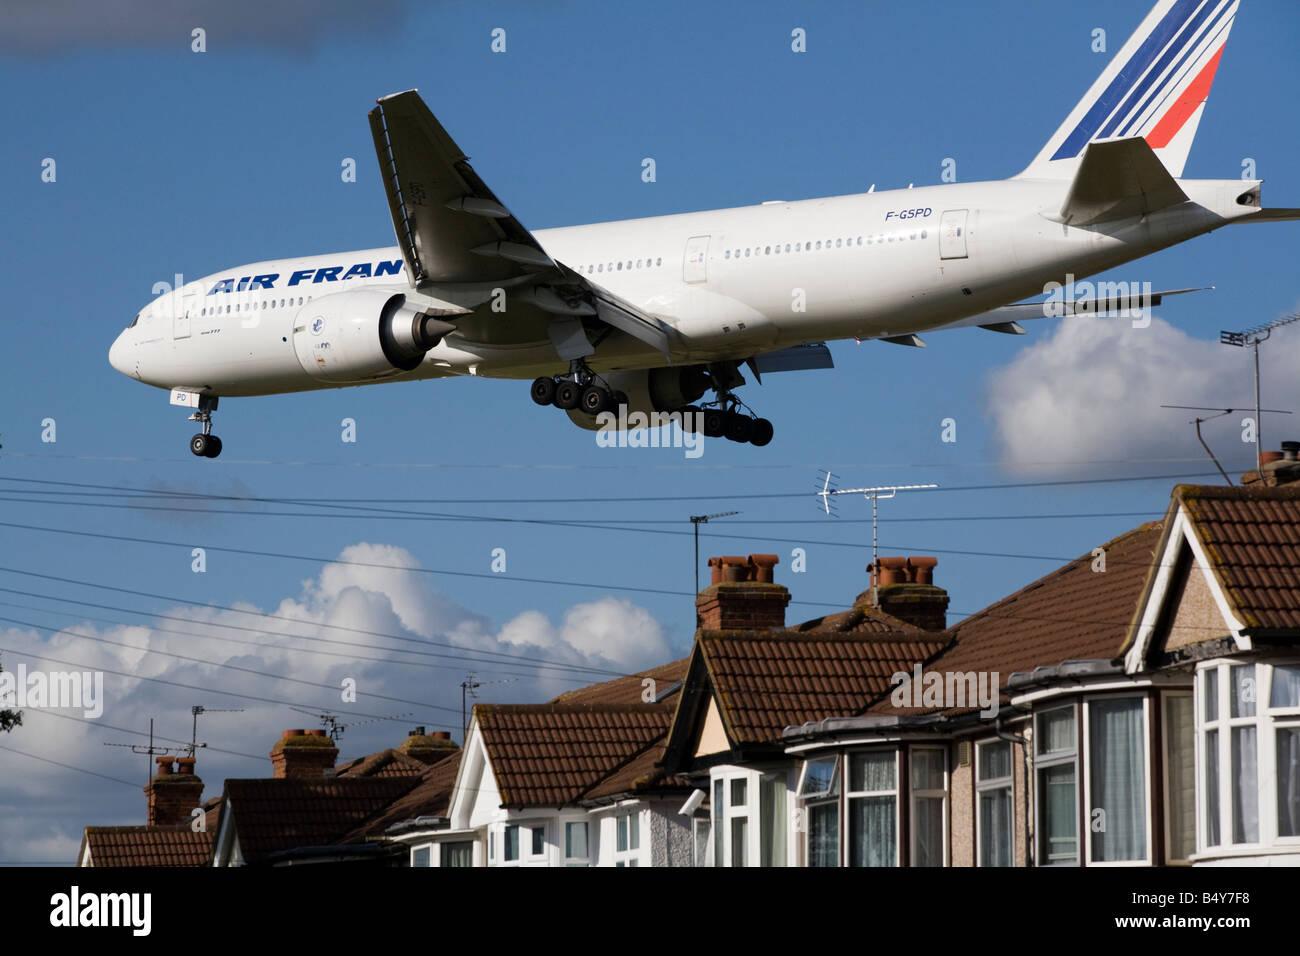 Air France Boeing 777-228(ER) plane landing at London